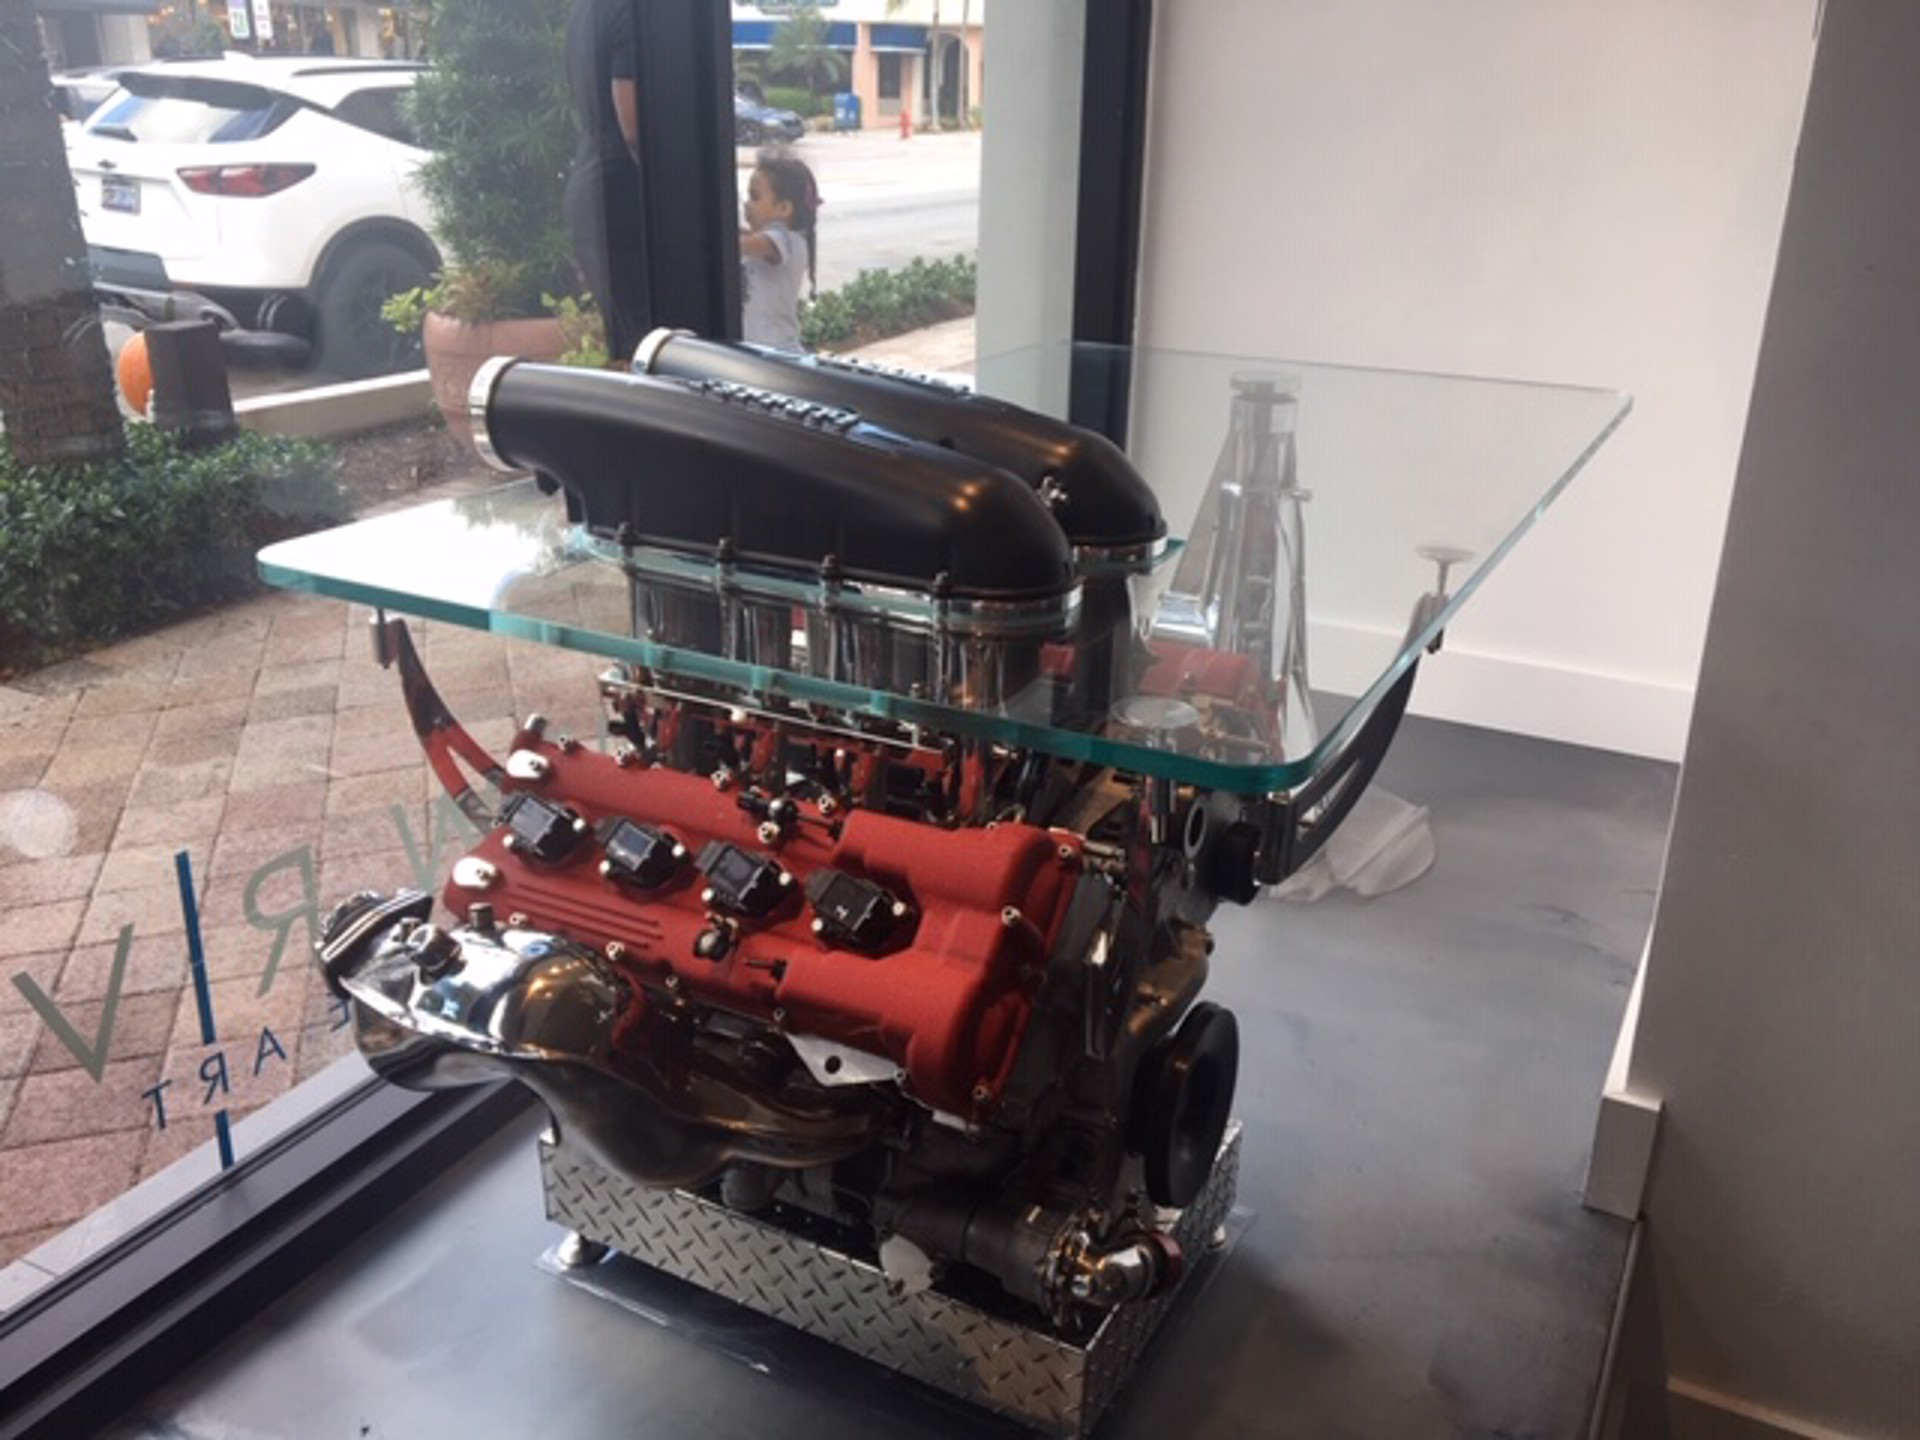 Ferrari 430 Challenge Desk by Tom Bates